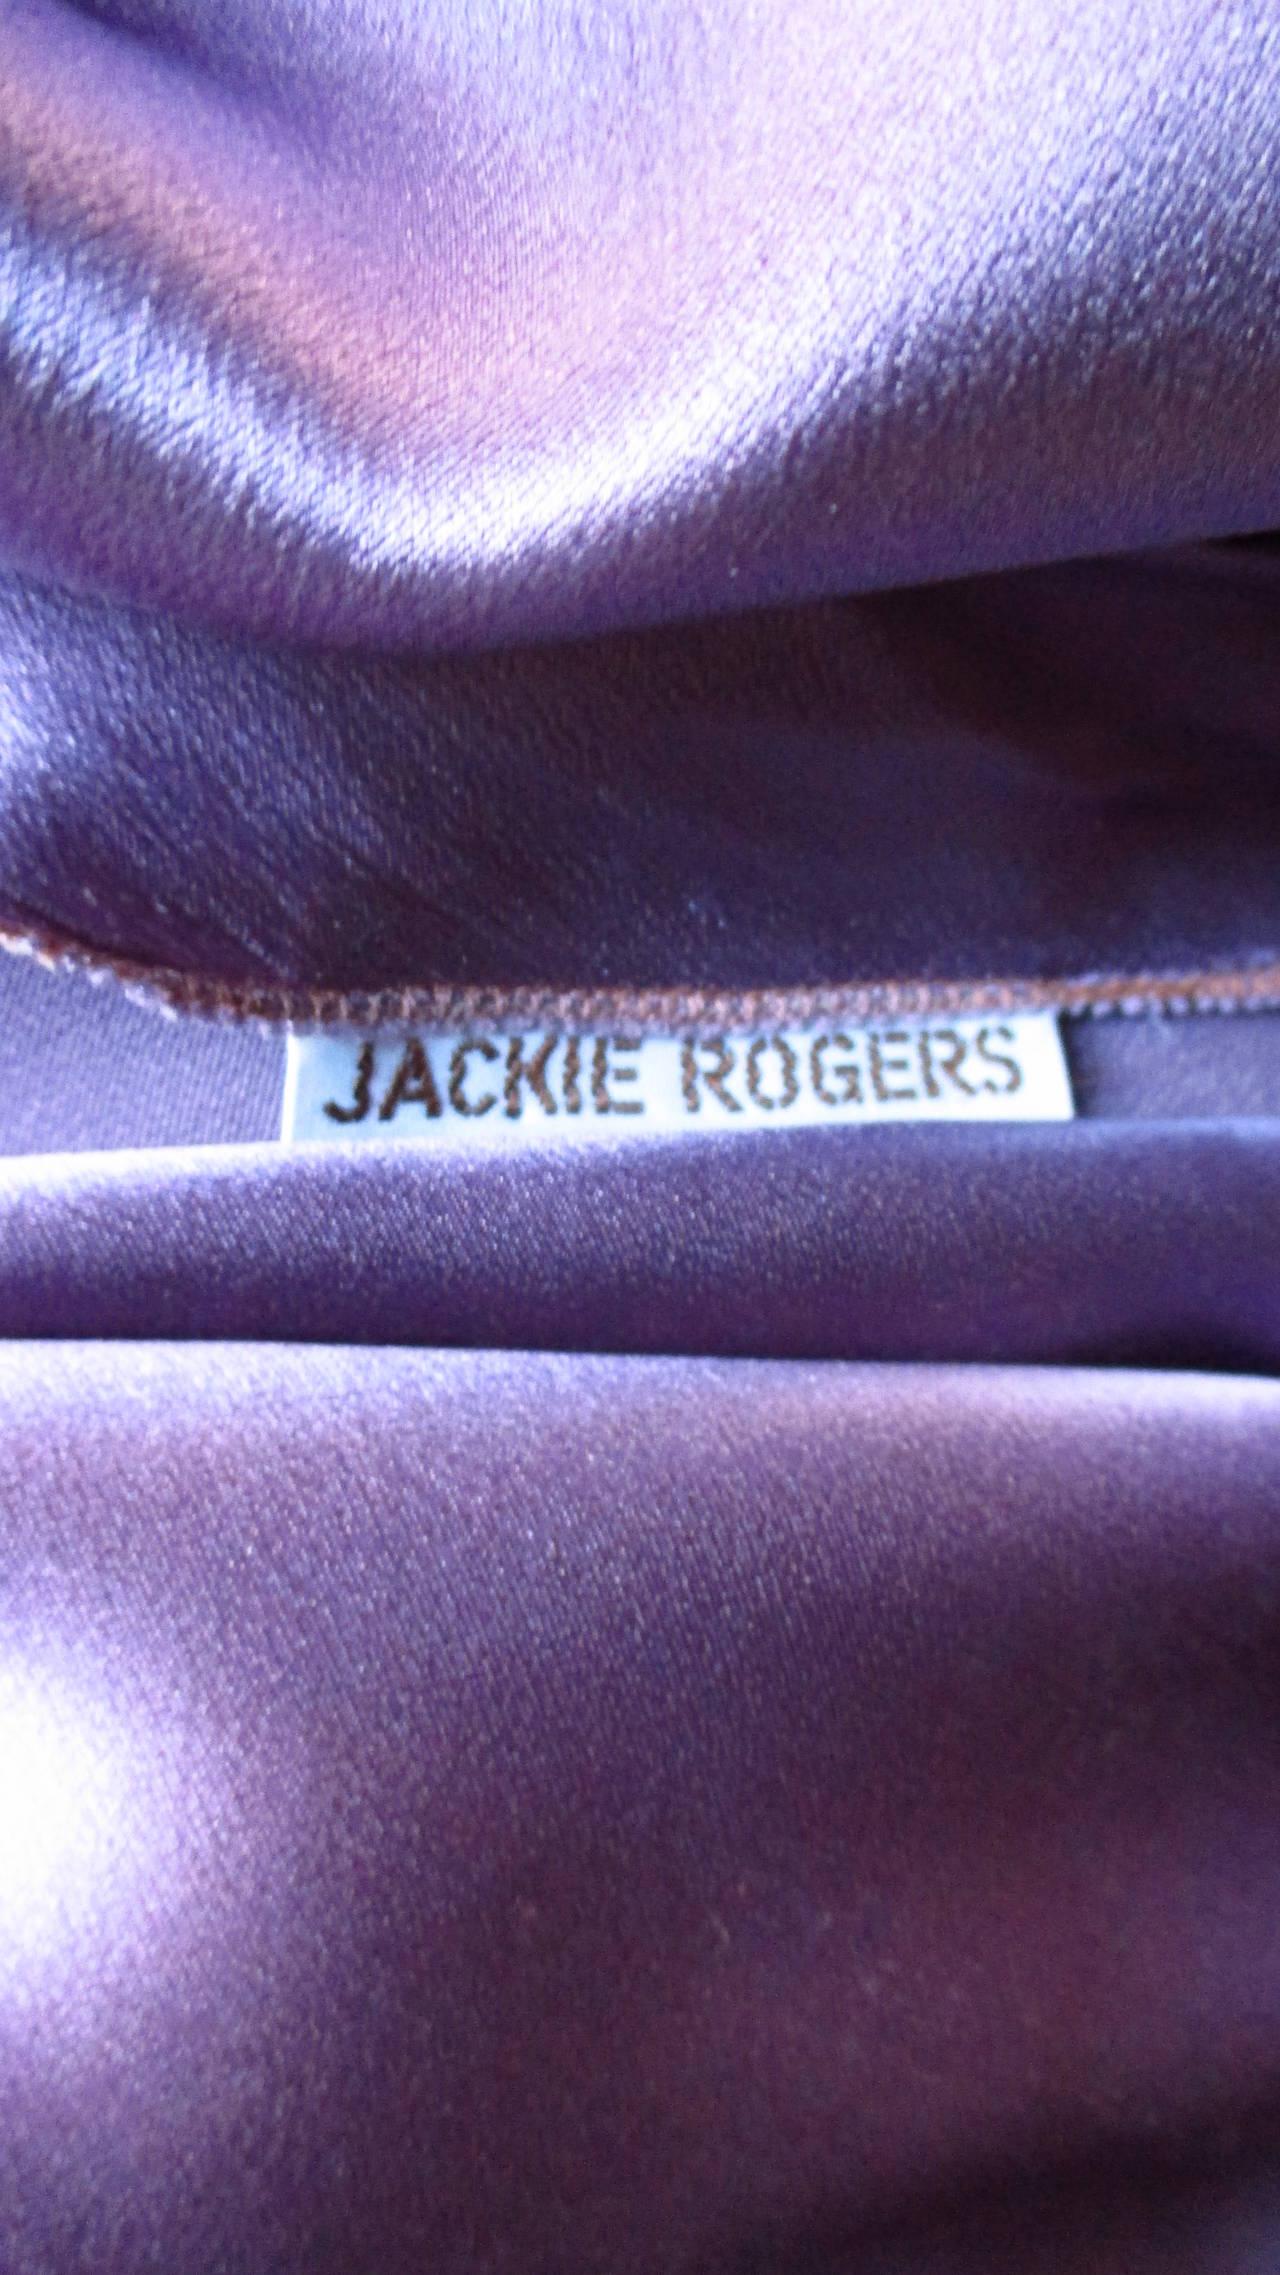 Jackie Rogers Silk Plunge Dress & Wrap For Sale 4